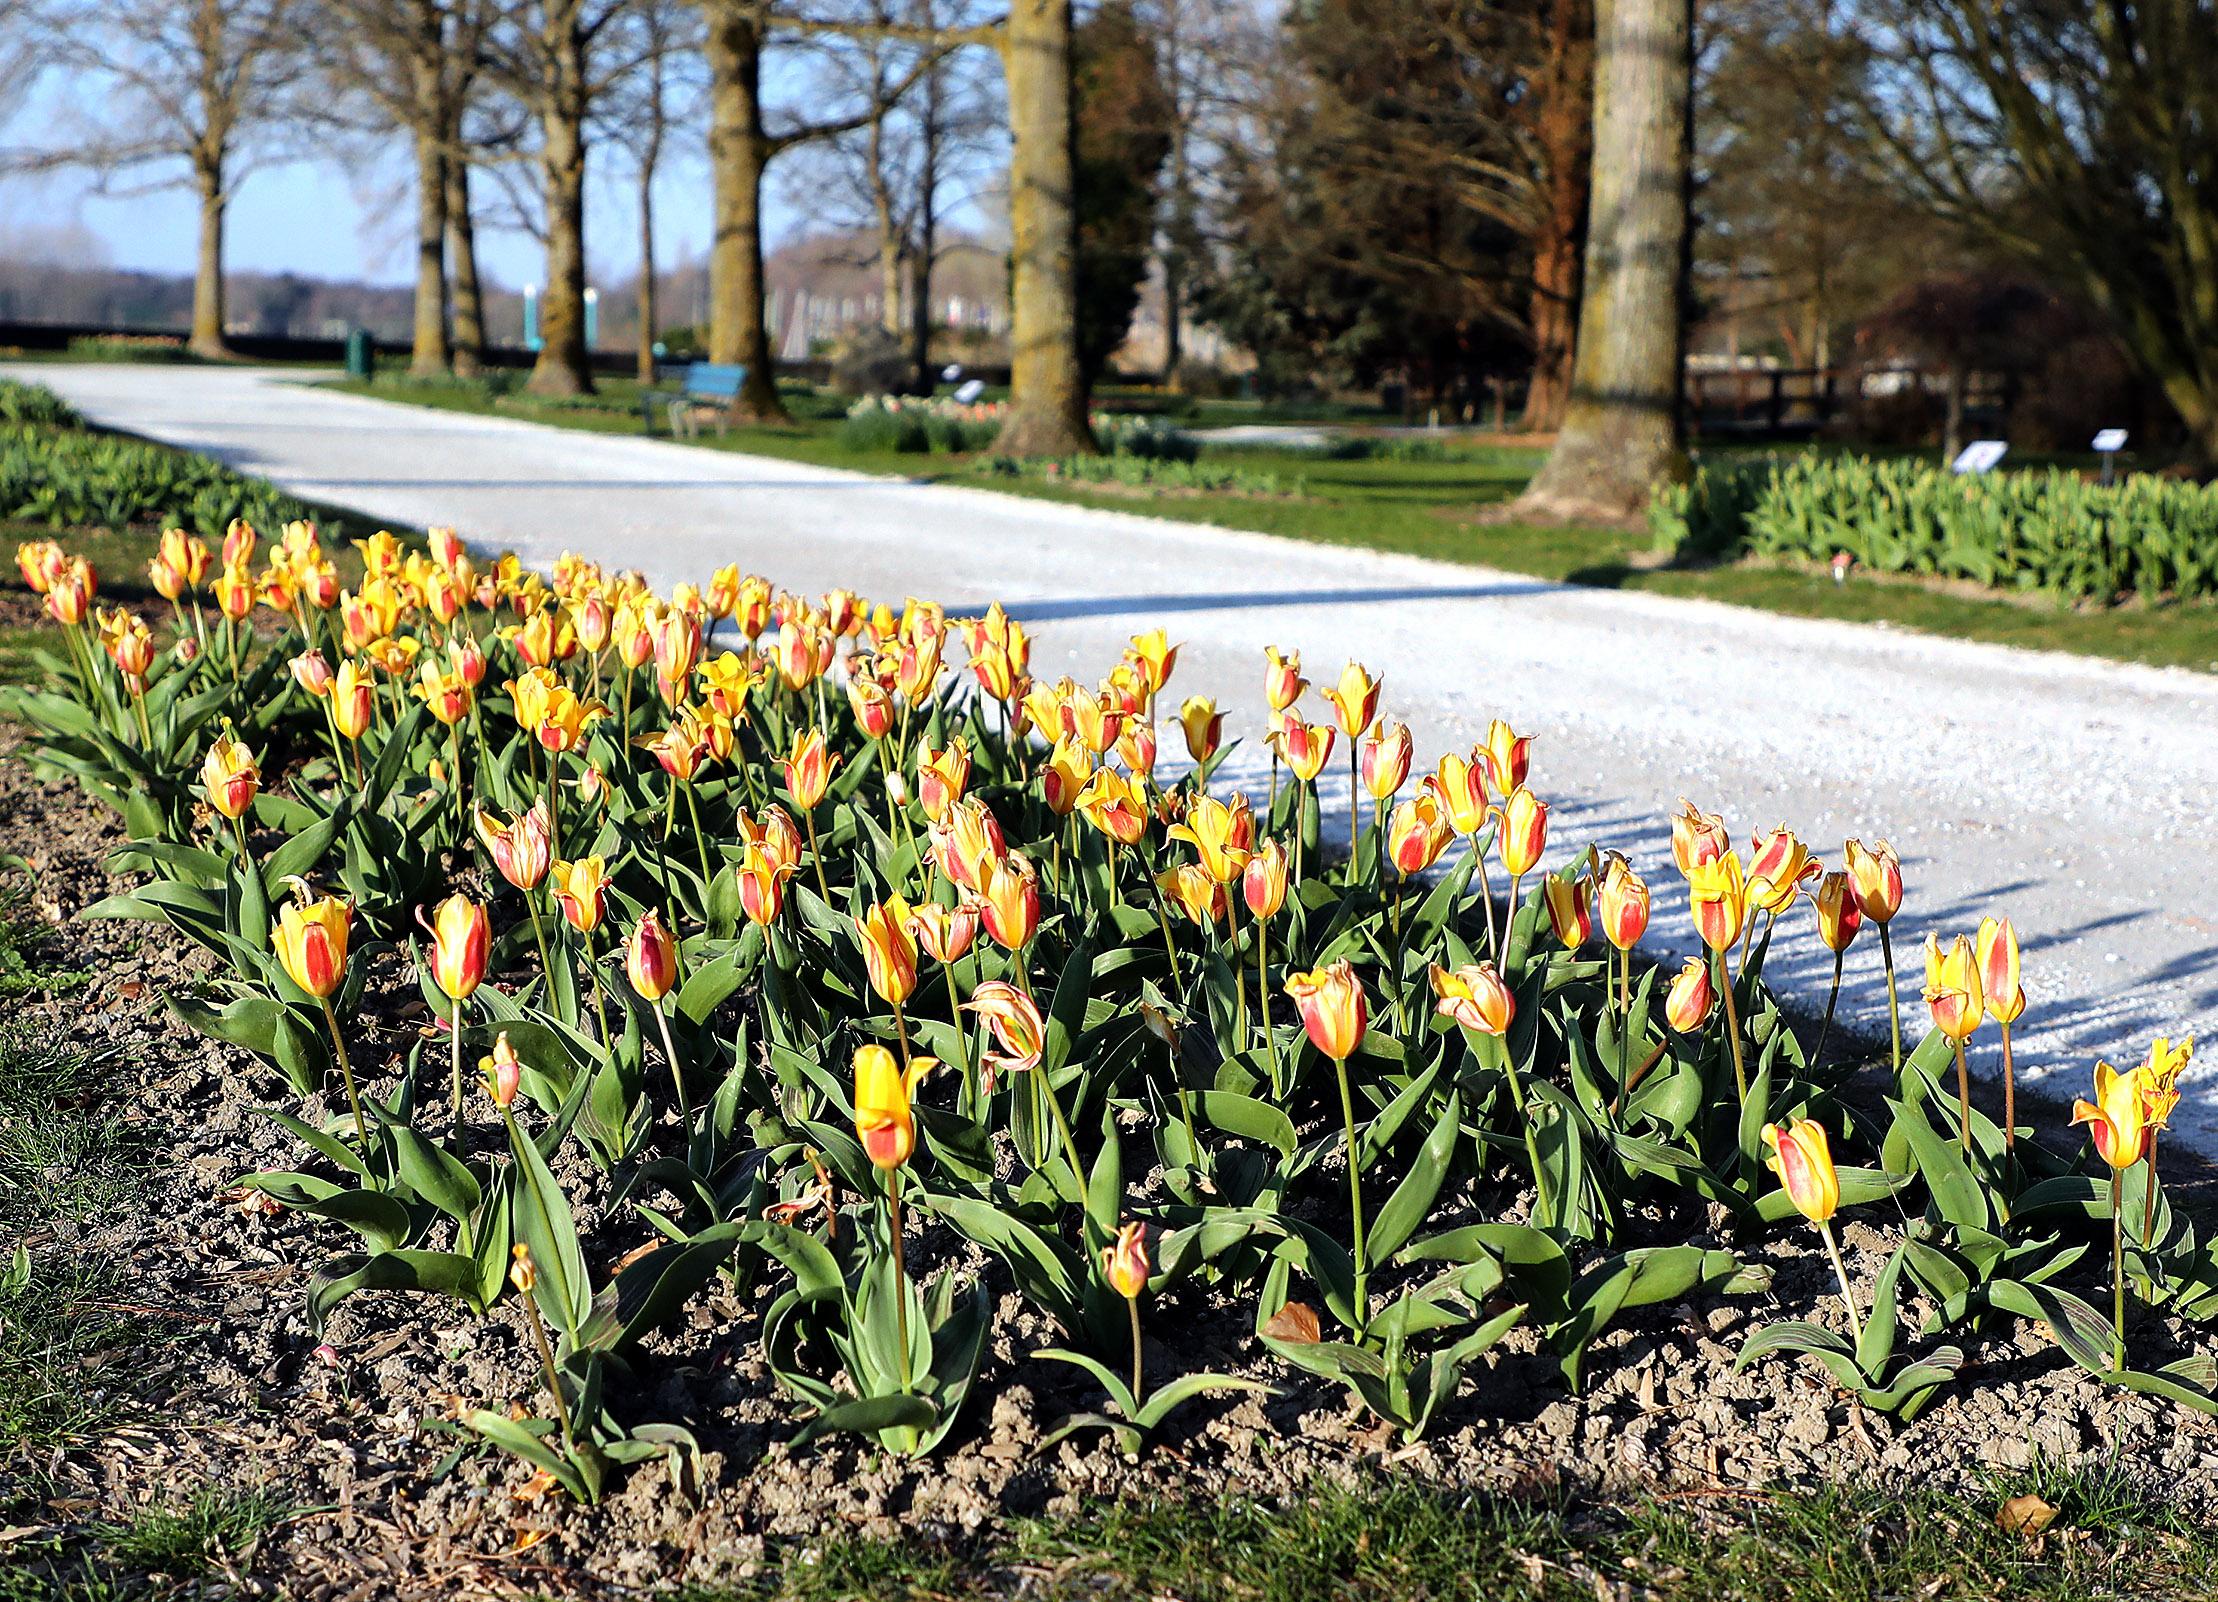 La Fête de la Tulipe confinée